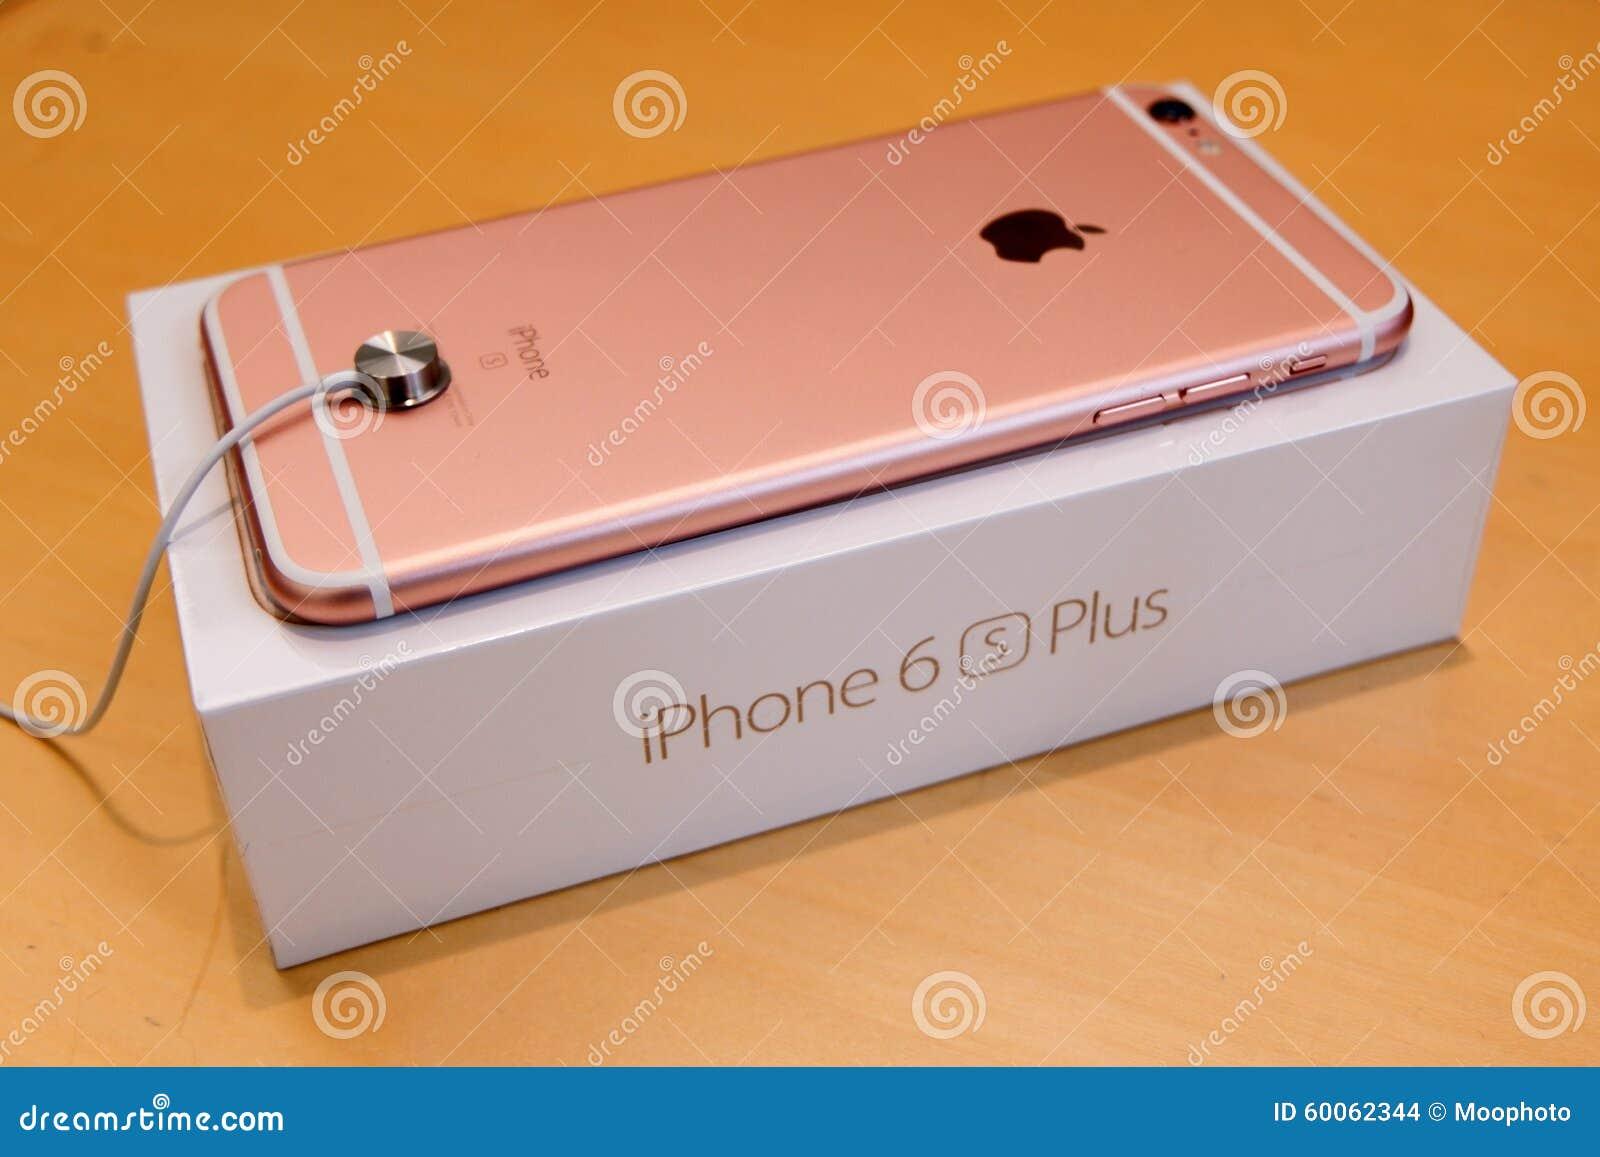 IPhone 6S mais Rose Gold Face Down na caixa varejo